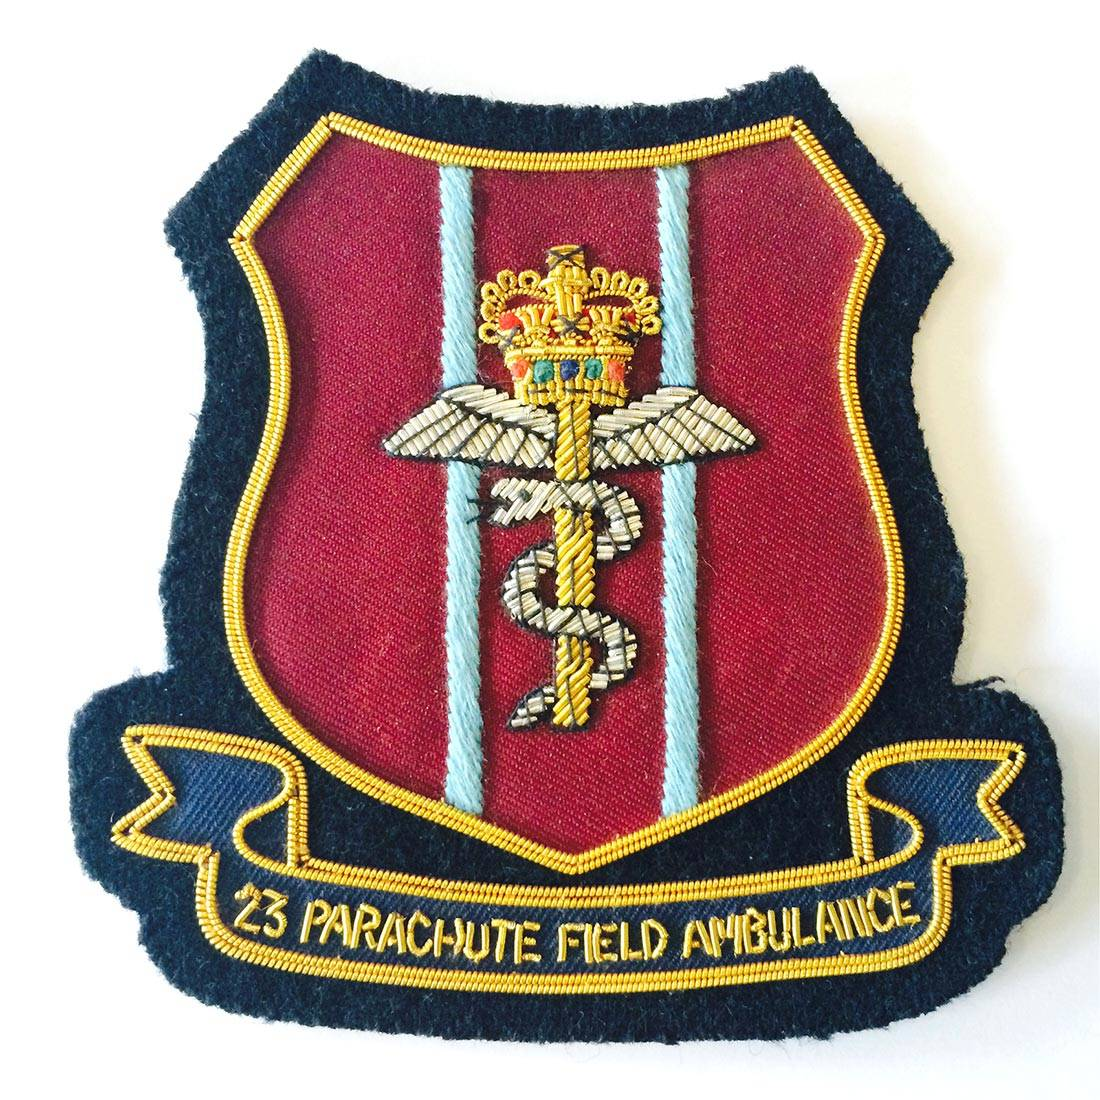 23 Pfa Blazer Badge - The Airborne Shop